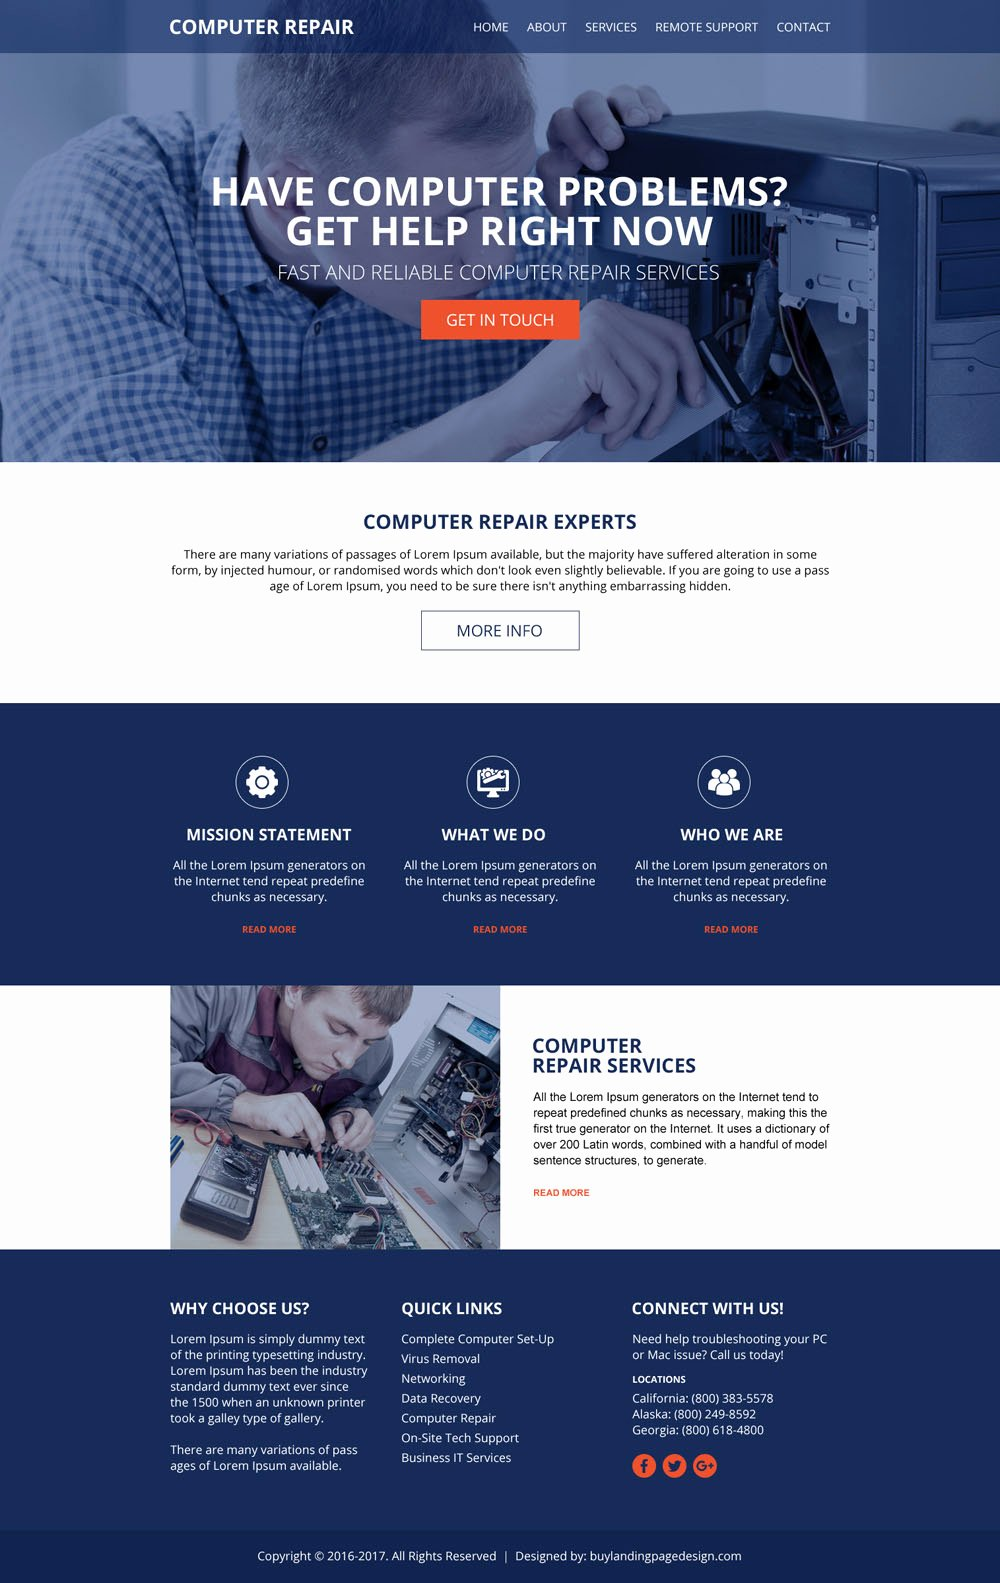 Computer Repairs Website Template Best Of Puter Repair Services Website Design Template